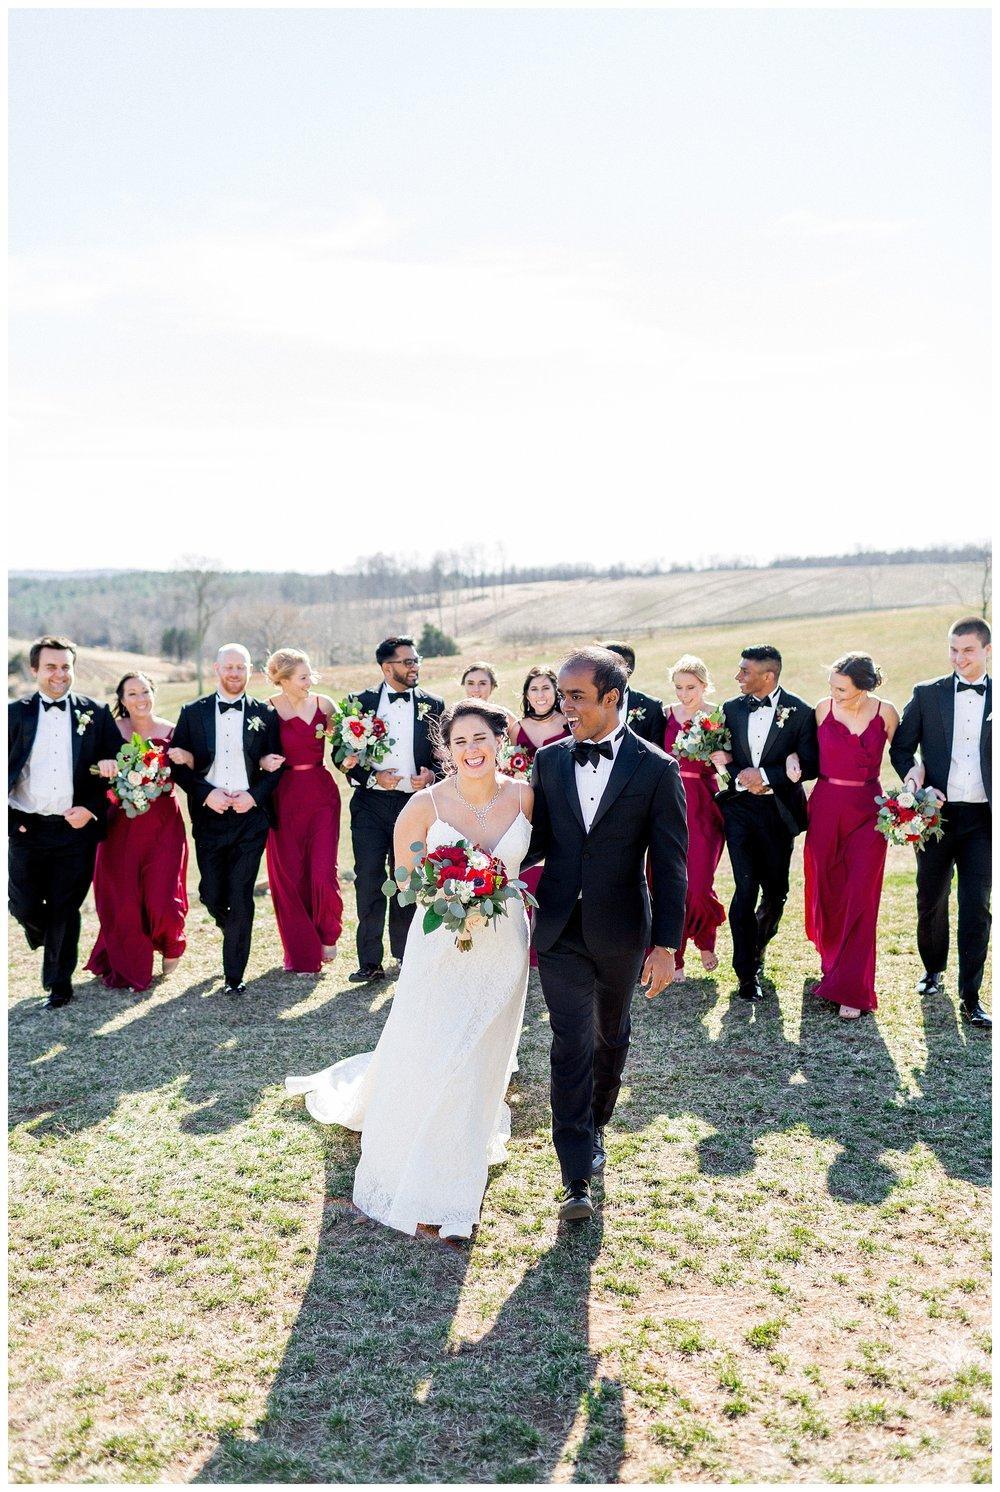 Stone Tower Winery Wedding | Virginia Winter Wedding | VA Wedding Photographer Kir Tuben_0080.jpg